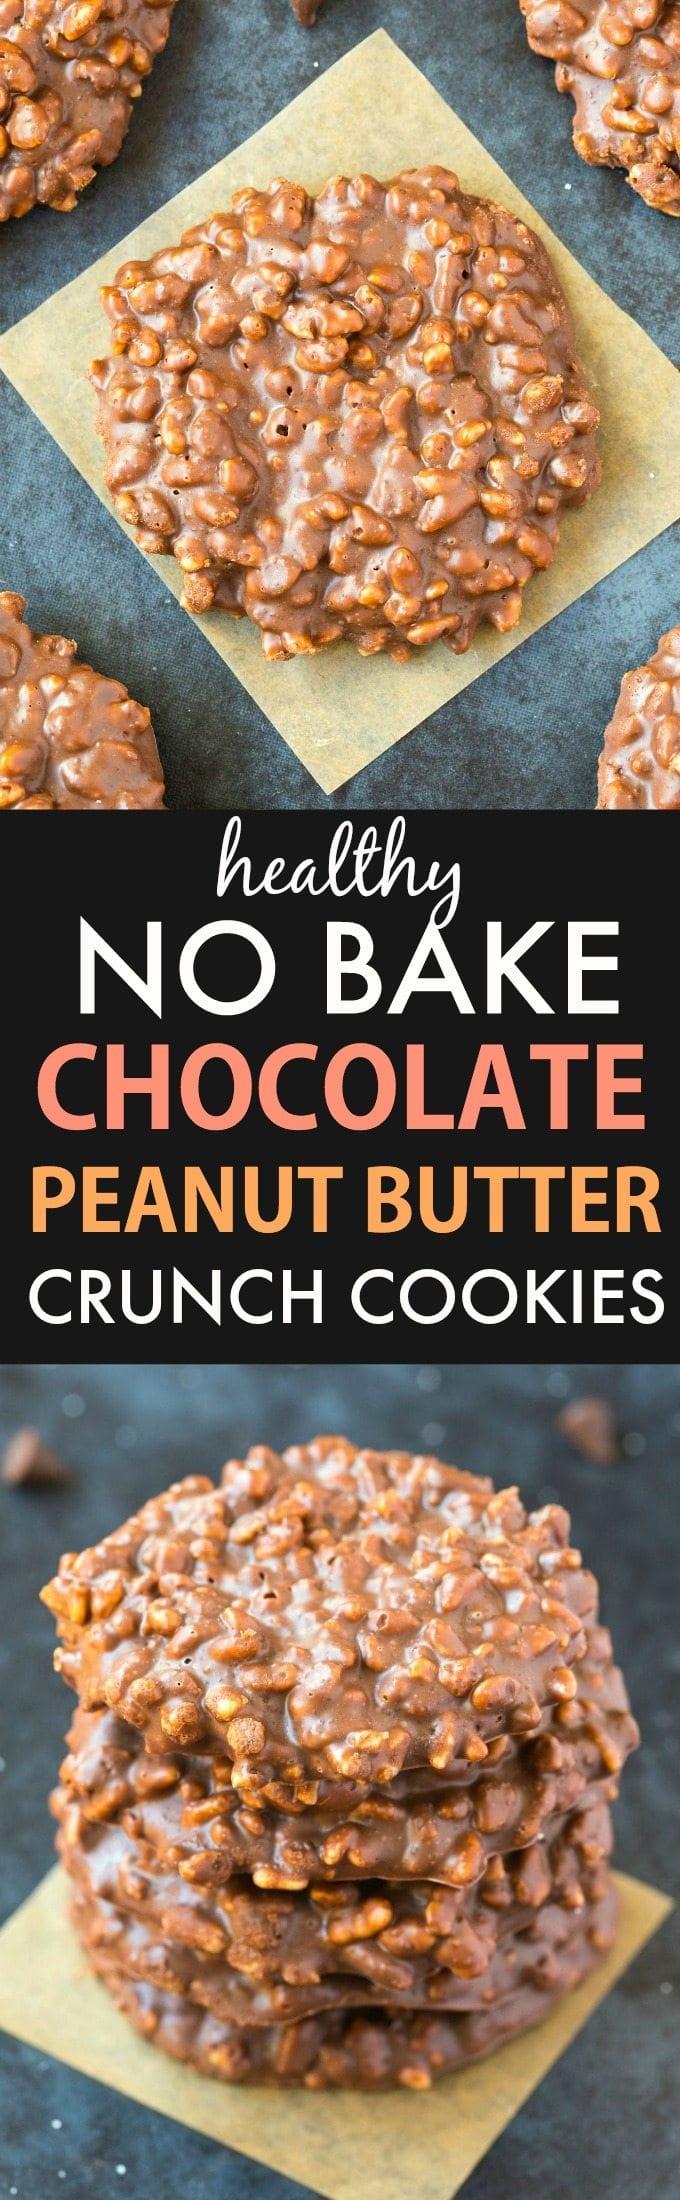 Healthy No Bake Chocolate Peanut Butter Crunch Cookies (Vegan ...